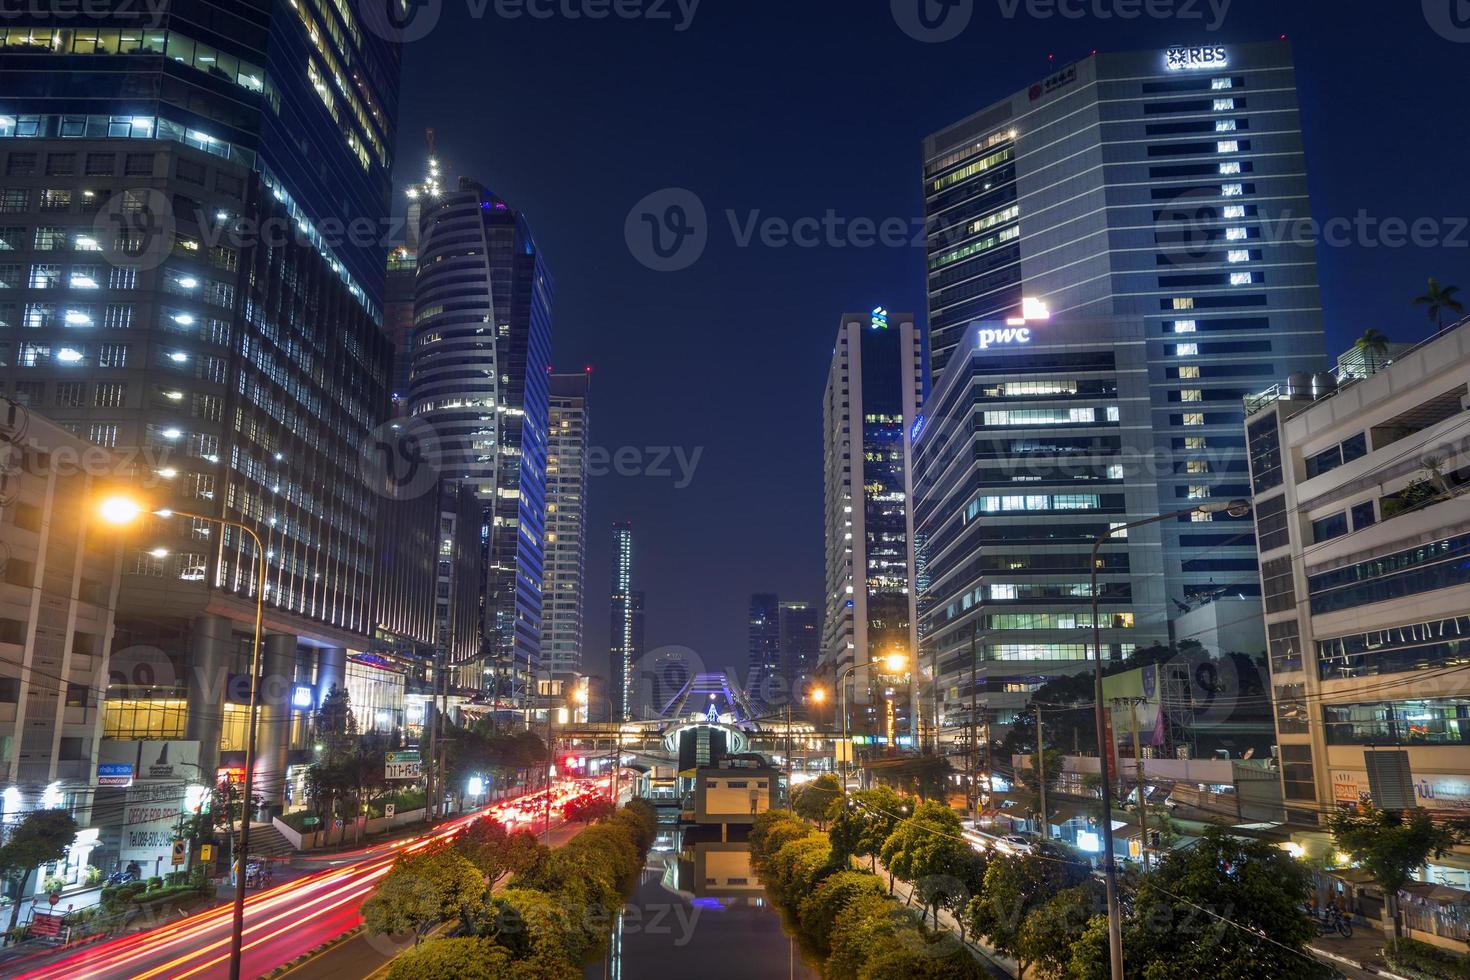 traffico notturno sulla strada di sathorn-narathiwas foto